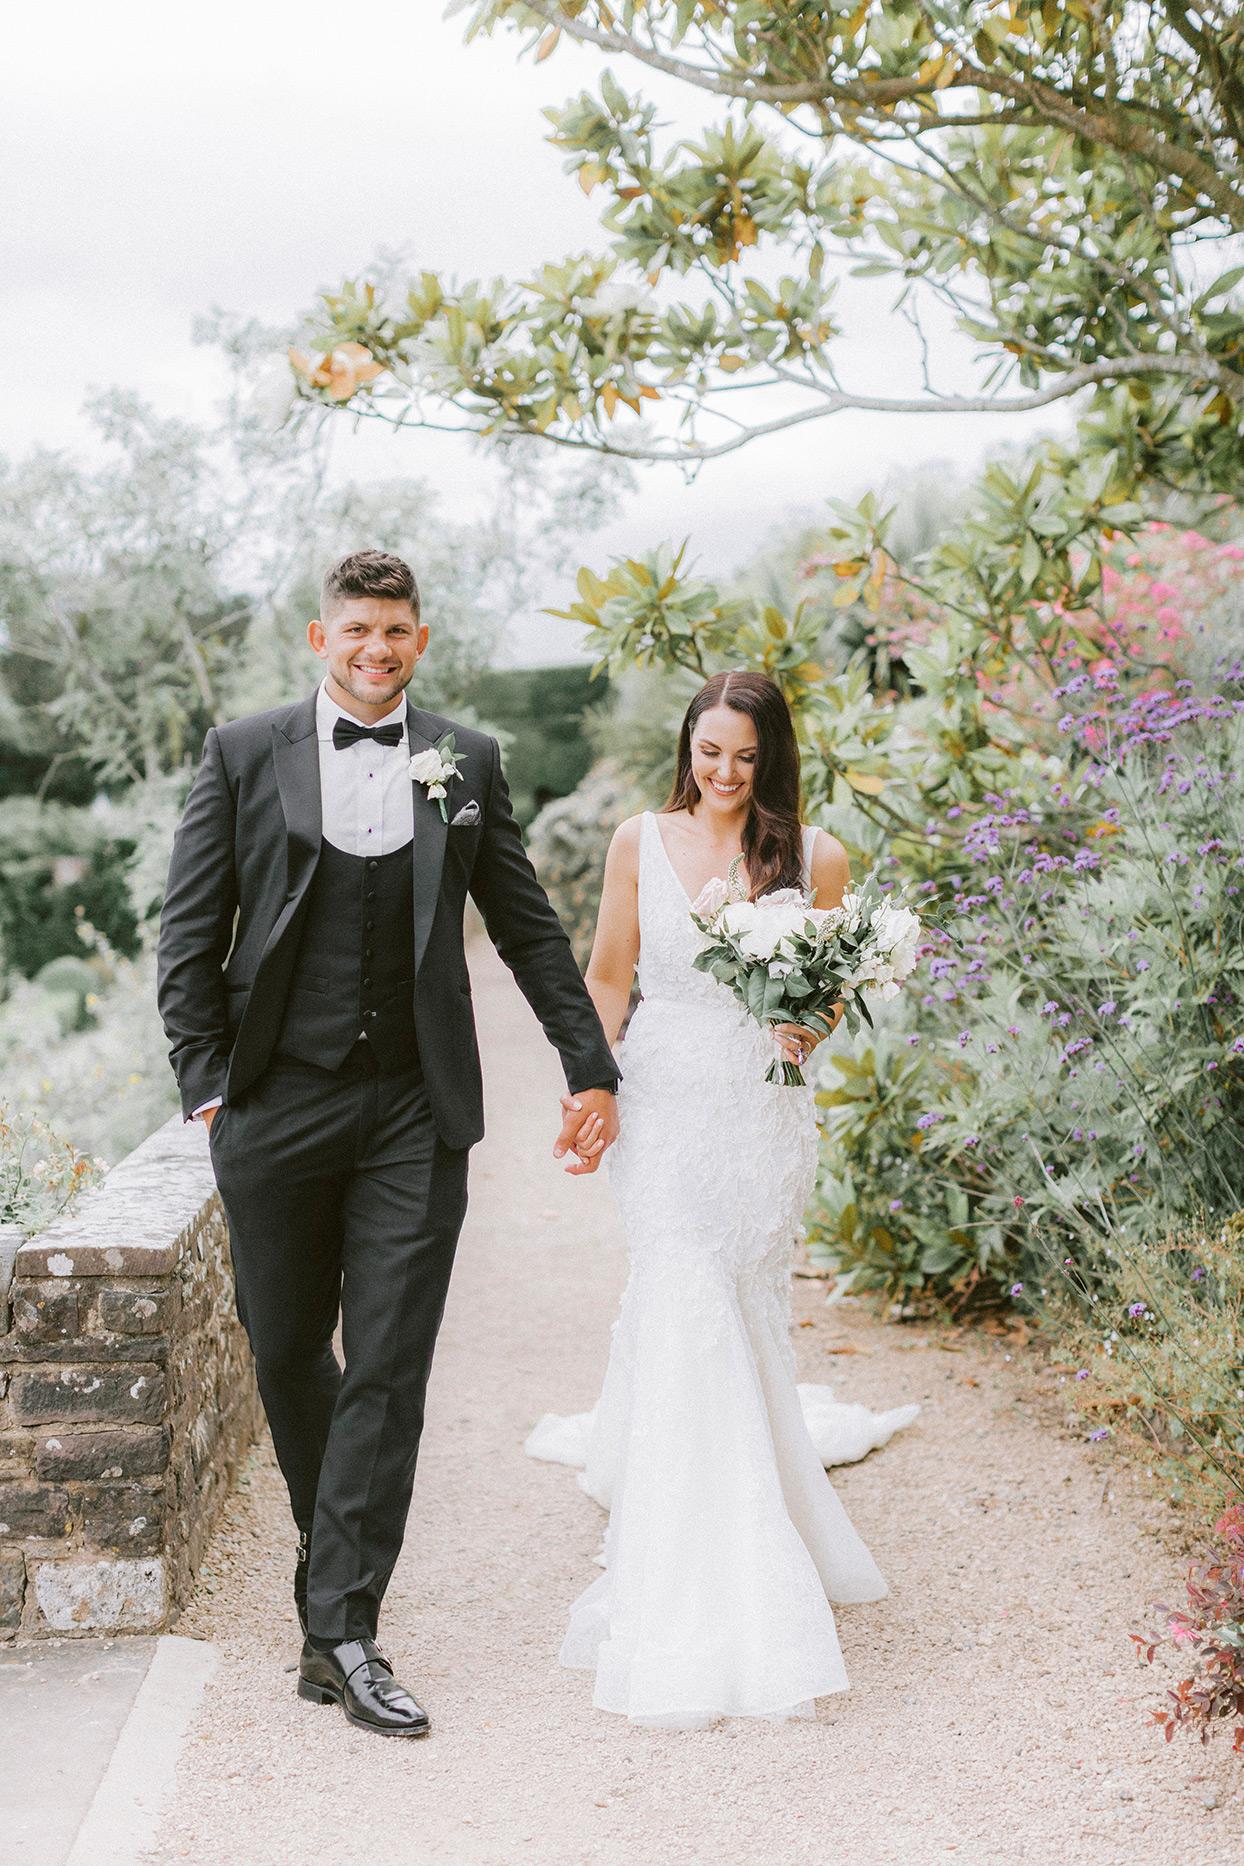 bride and groom walking along gravel path in garden